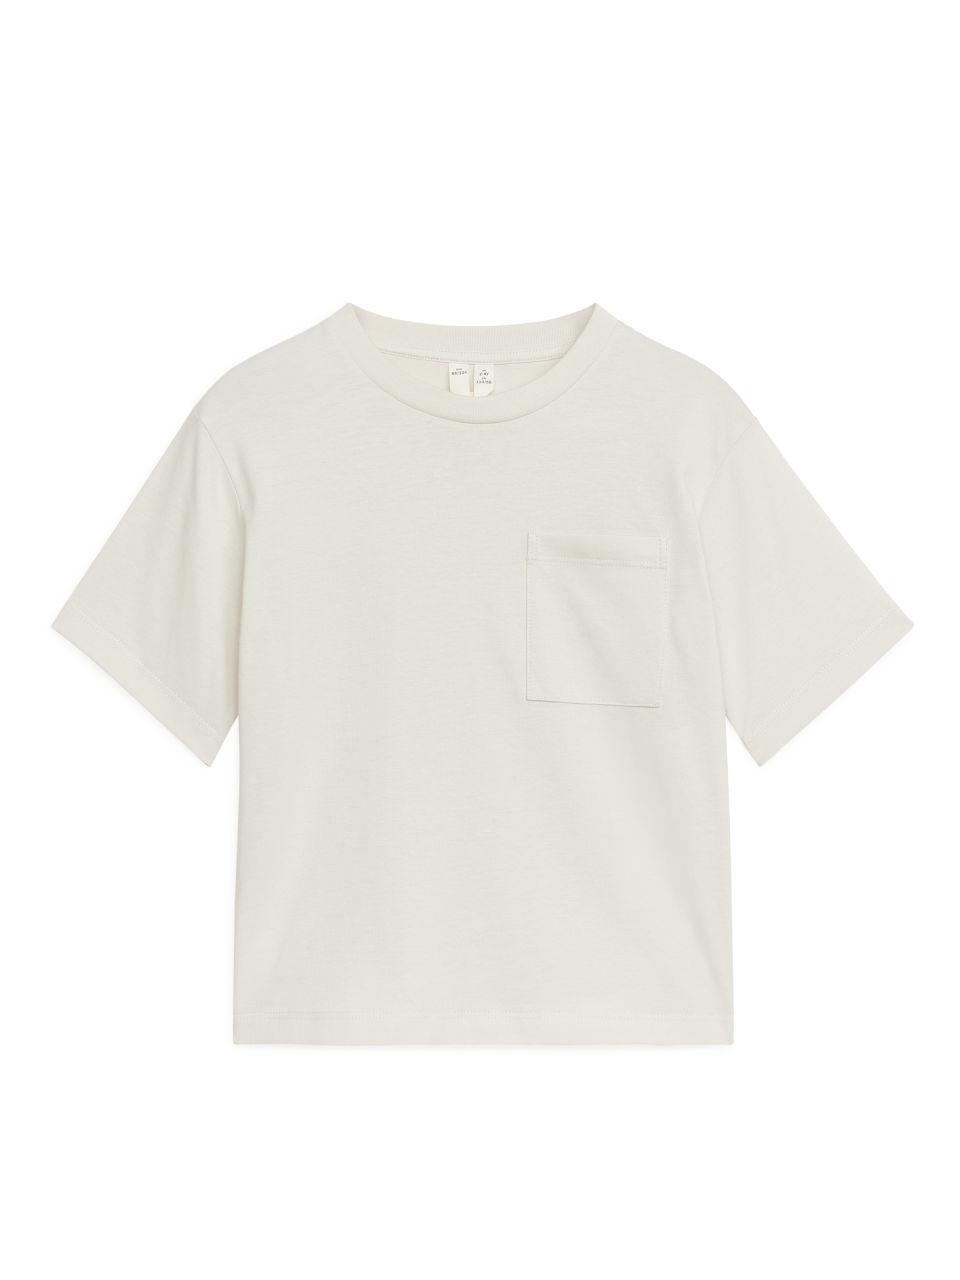 Loose Fit T-Shirt - Beige